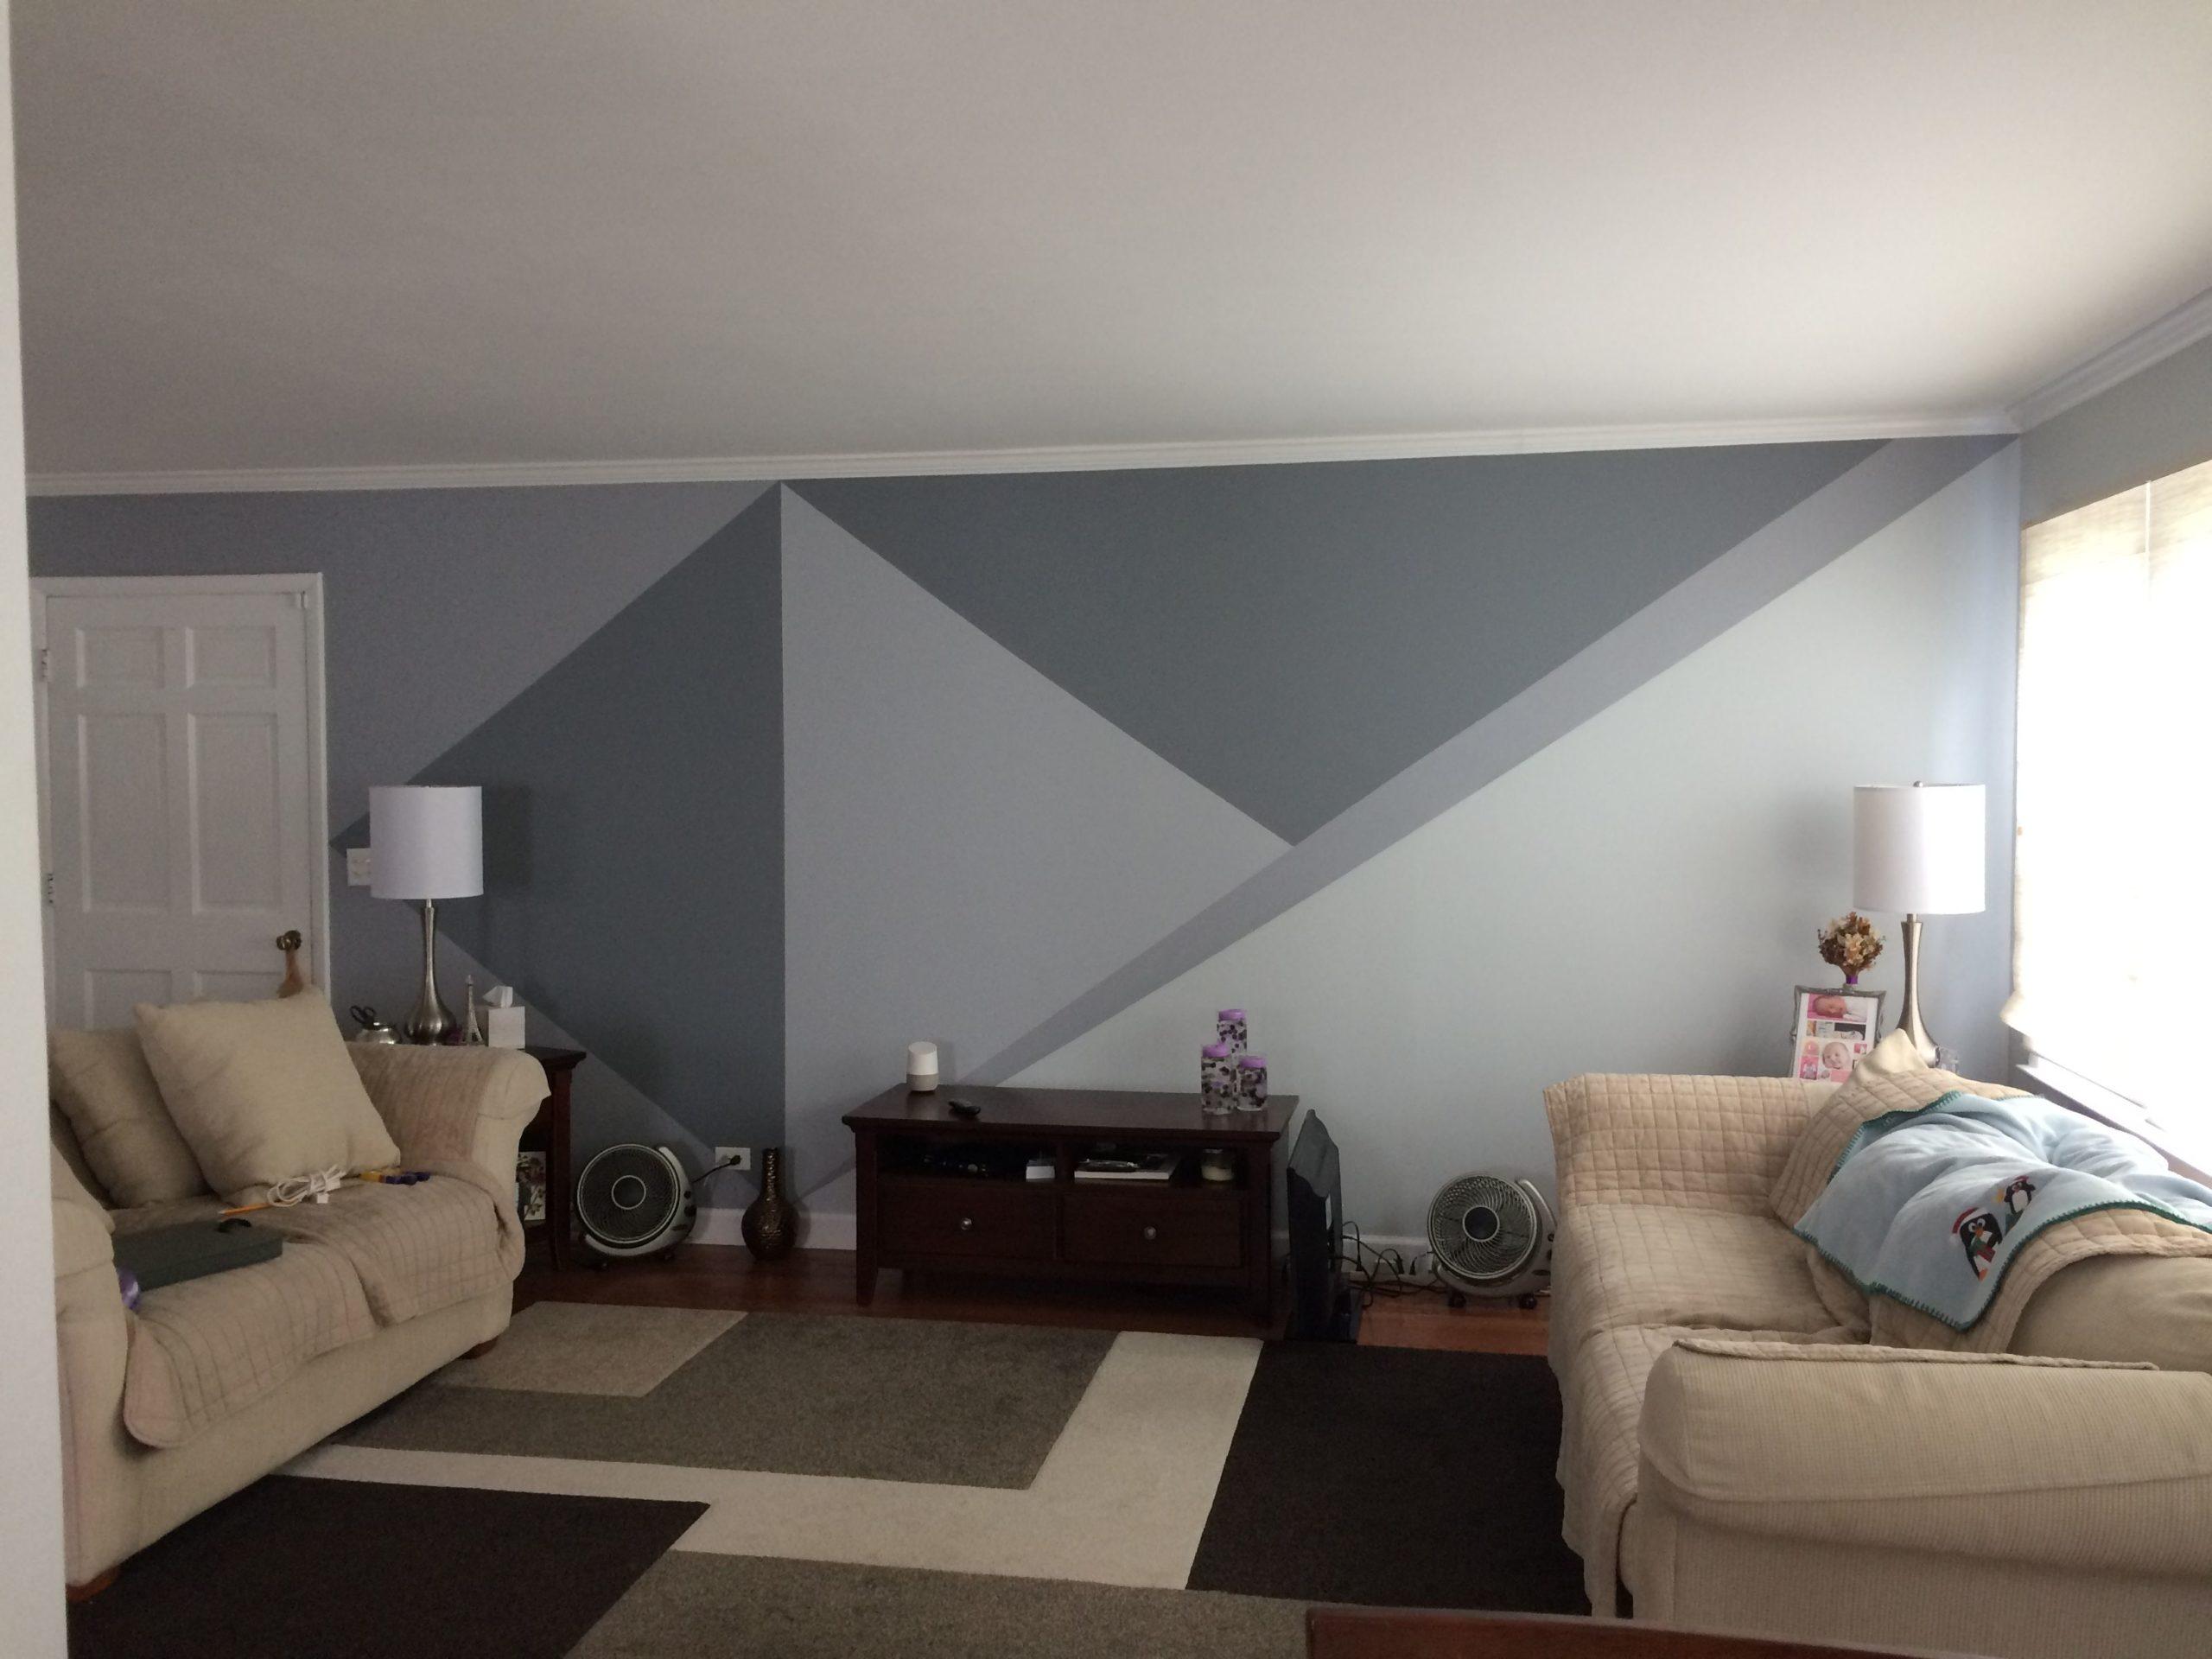 Parede geométrica cinza